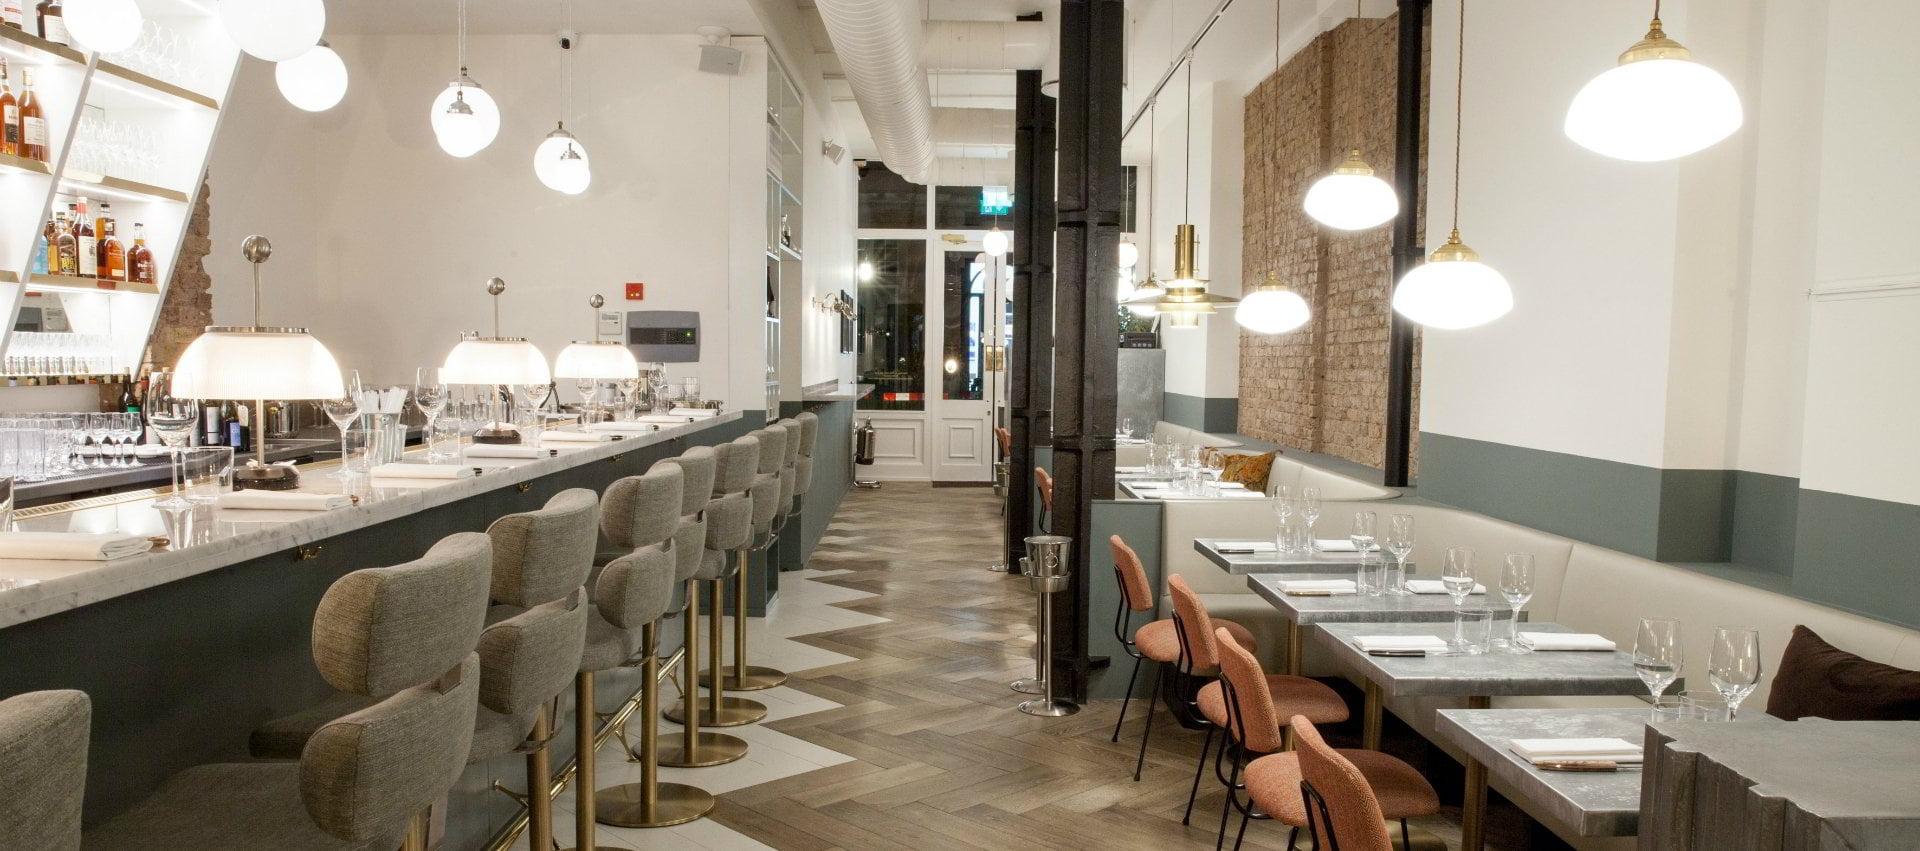 The Best Restaurants In Covent Garden & Holborn